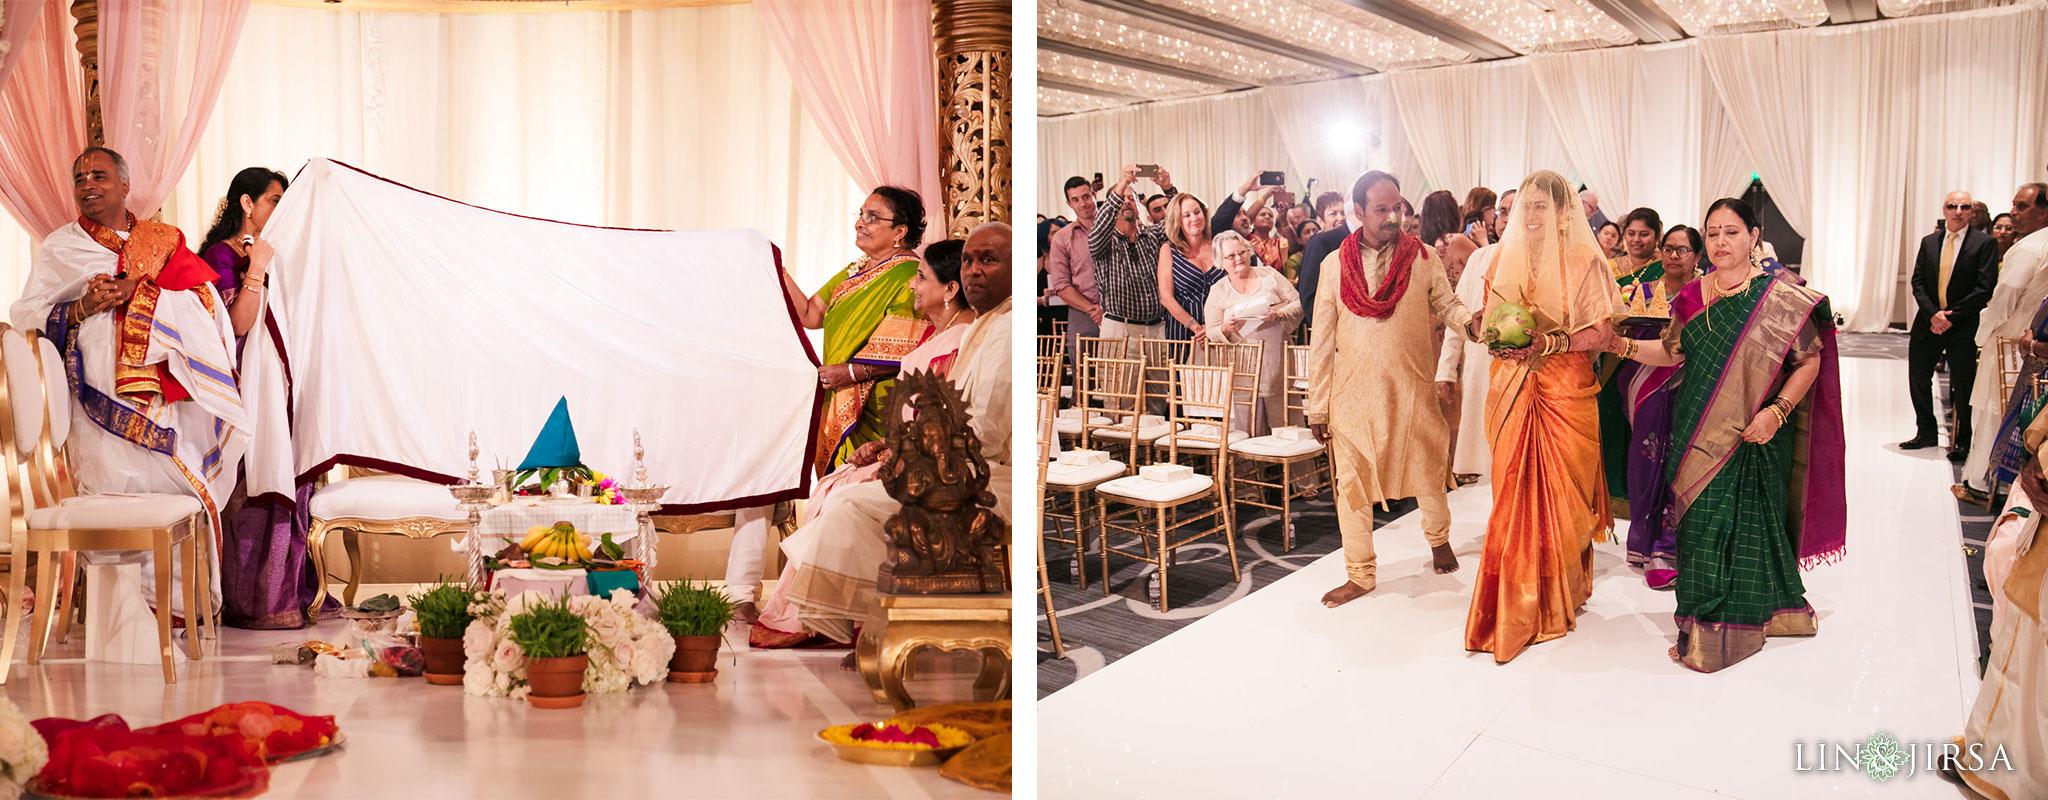 15 long beach hyatt south indian wedding photography